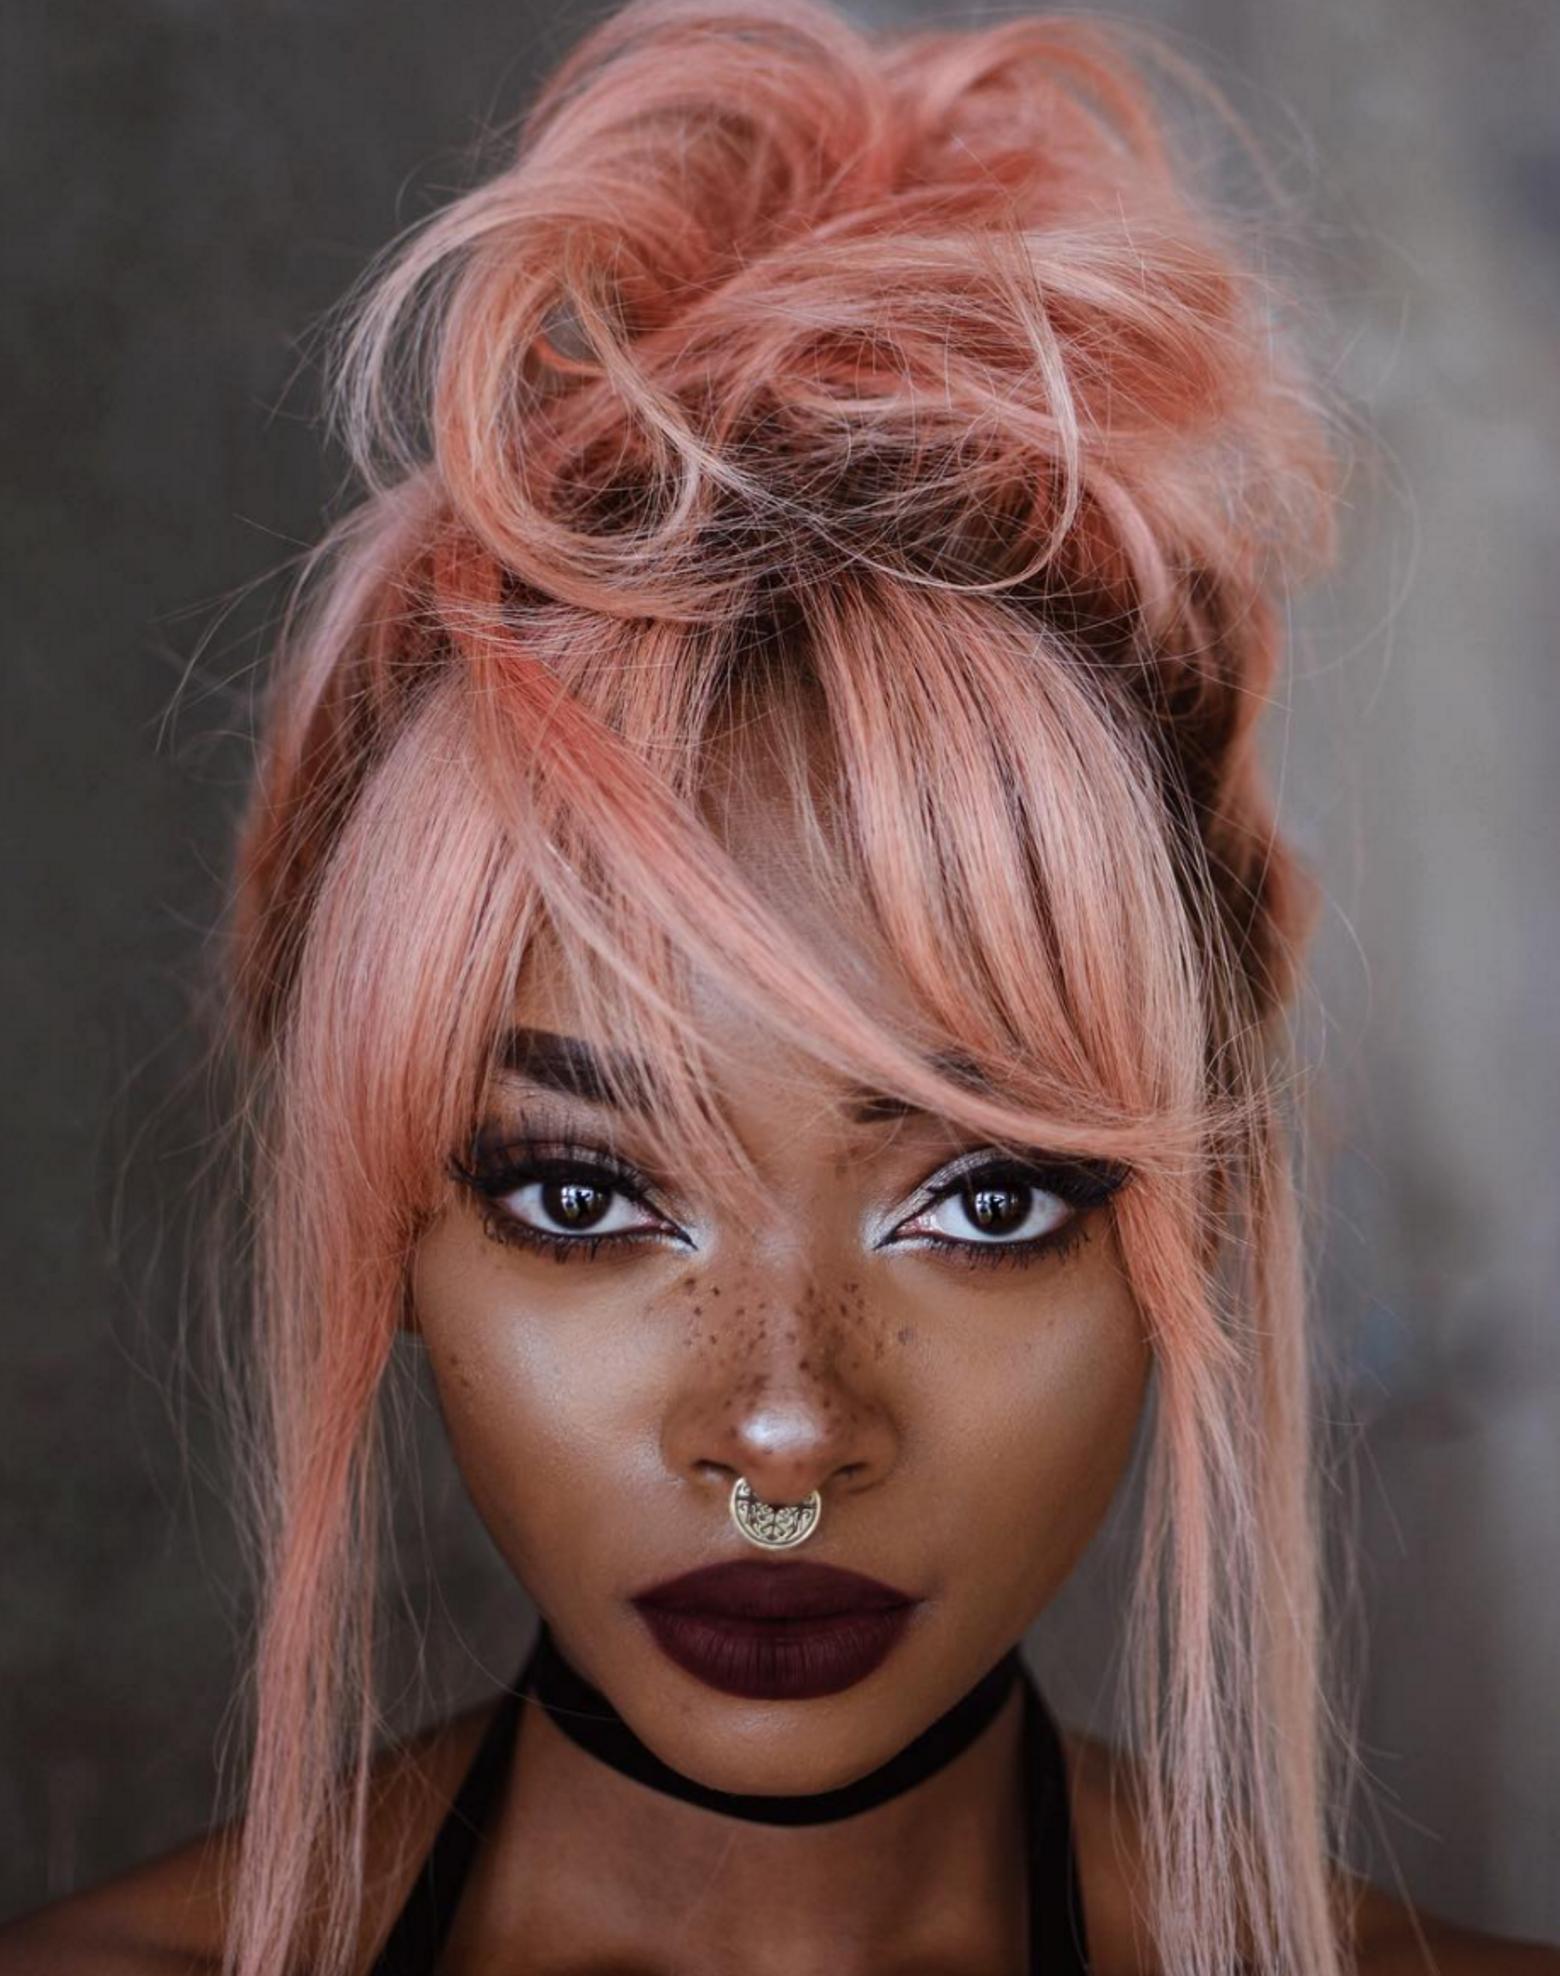 See Nyane Lebajoa's Summery Freckle Makeup Look